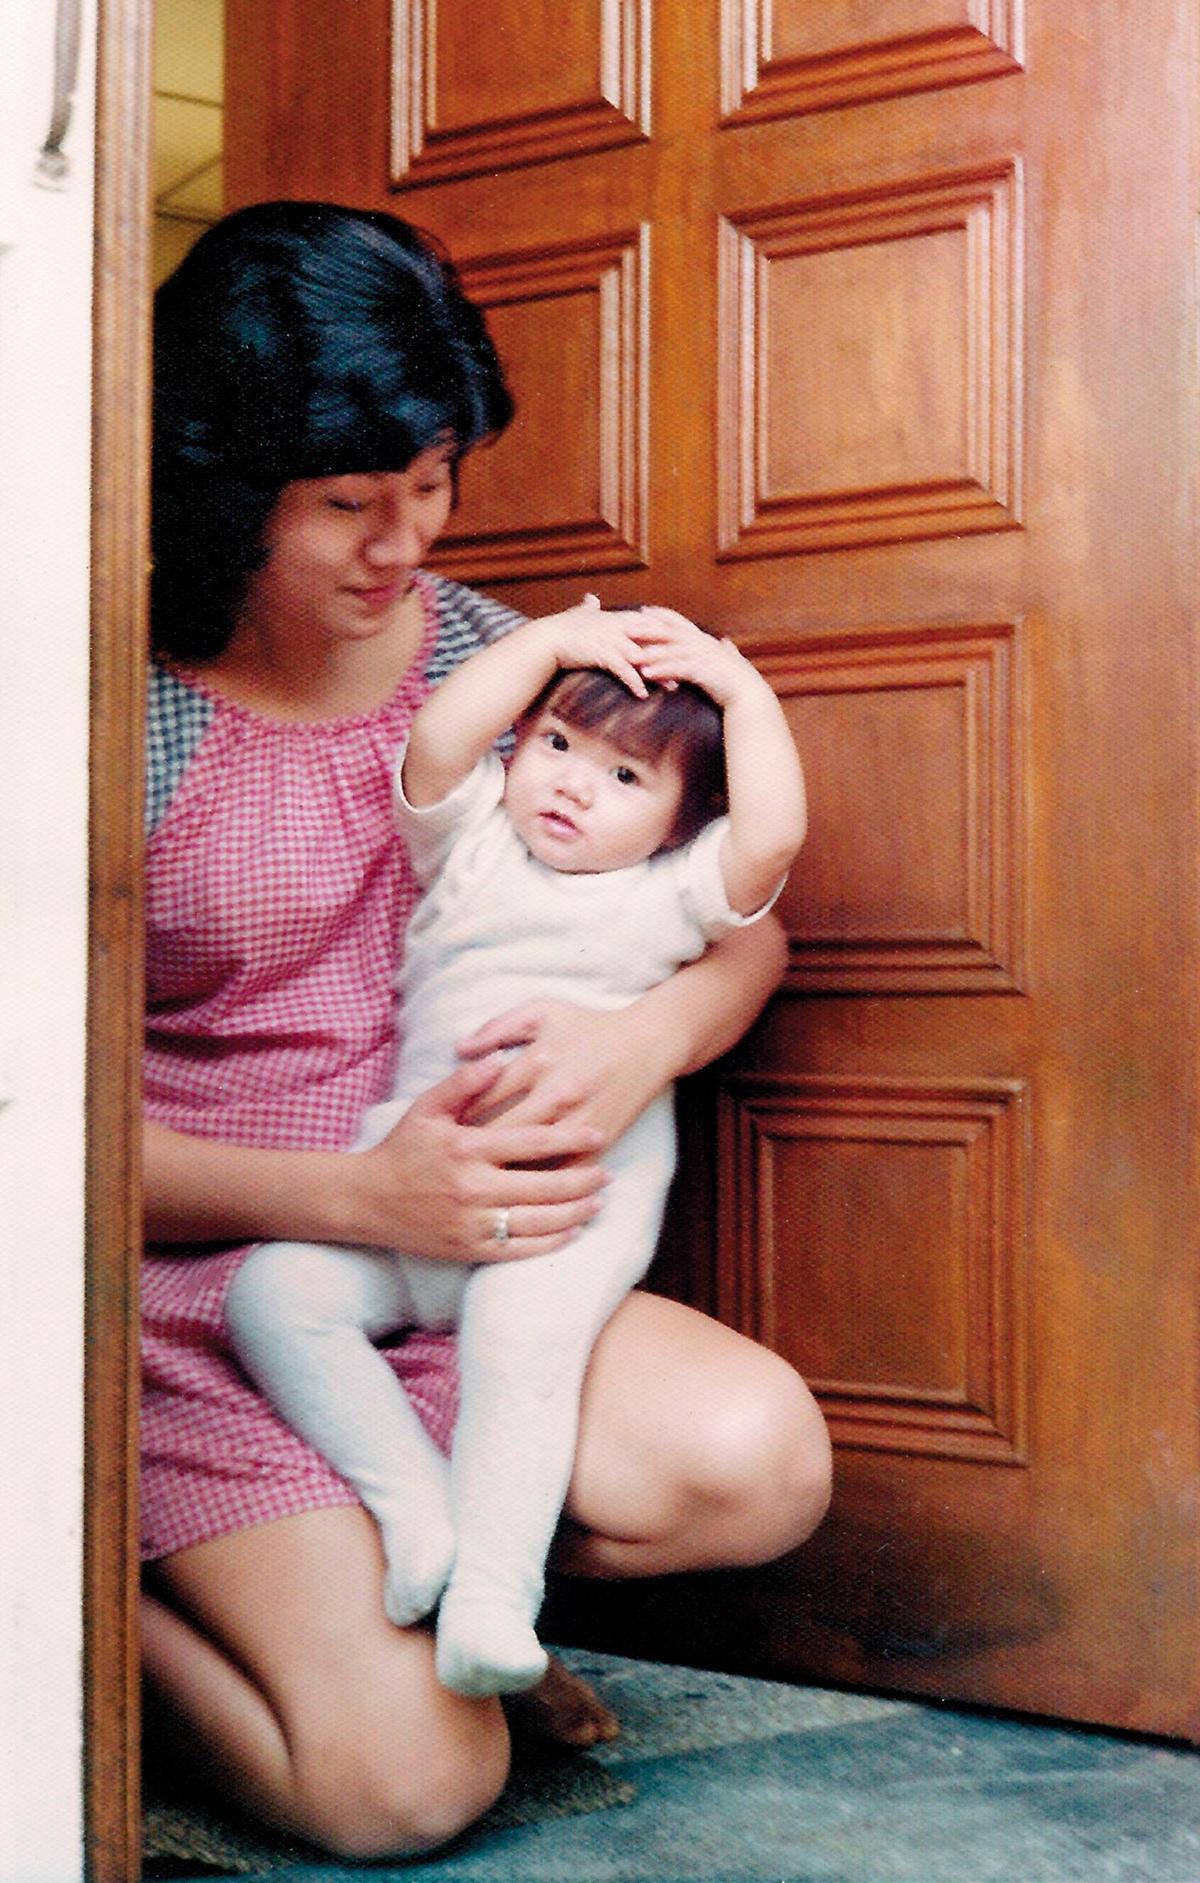 Phyllis的父母離婚後,母親和她相依為命,也處處影響Phyllis求學、出國和結婚的決定。(Phyllis提供)